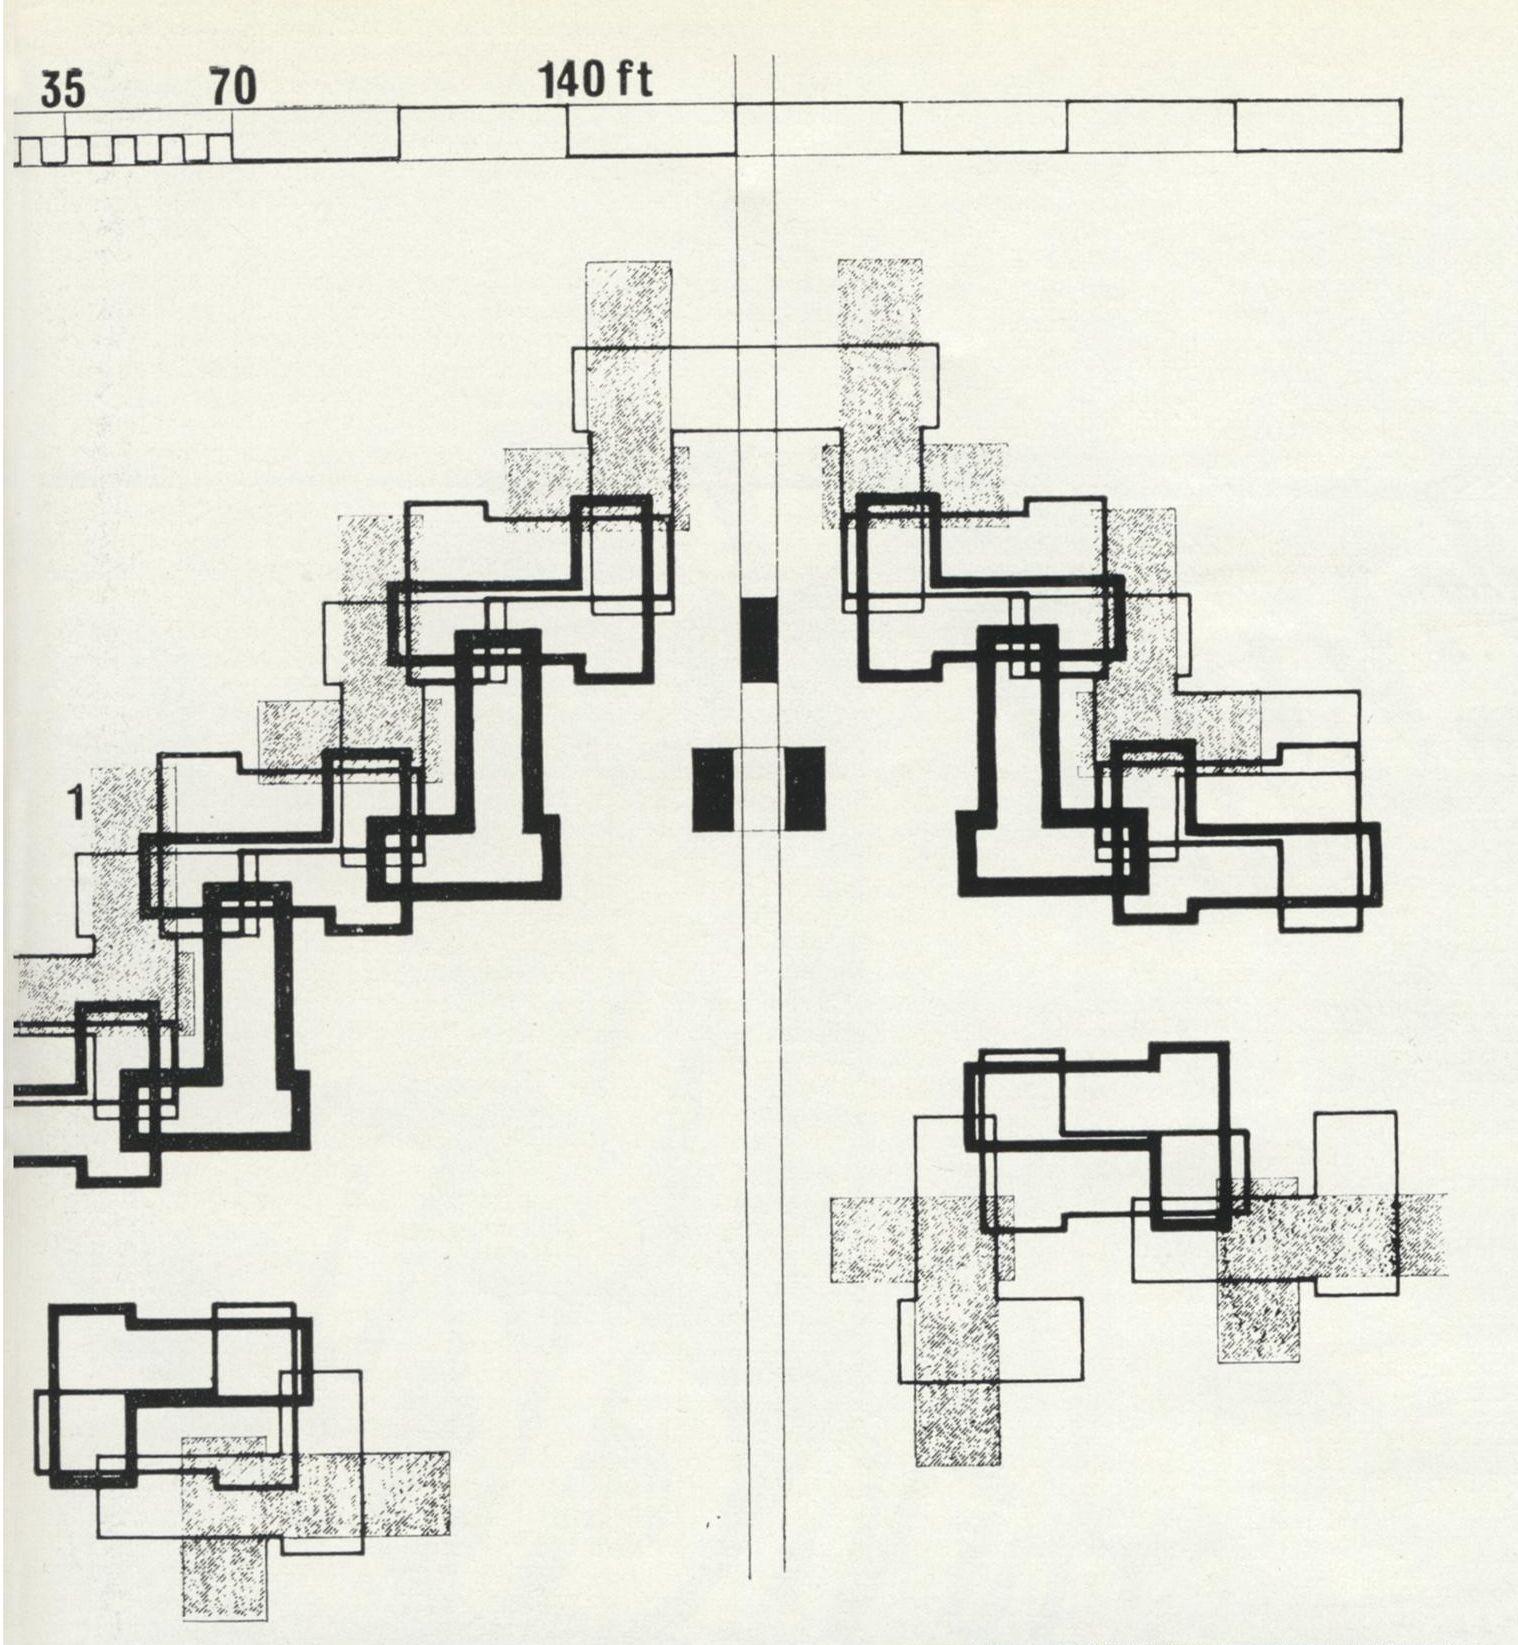 Habitat 67 Moshe Safdie Modern Architecture A Visual Lexicon 723x783 Jpeg Architecture Habitats Site Plan